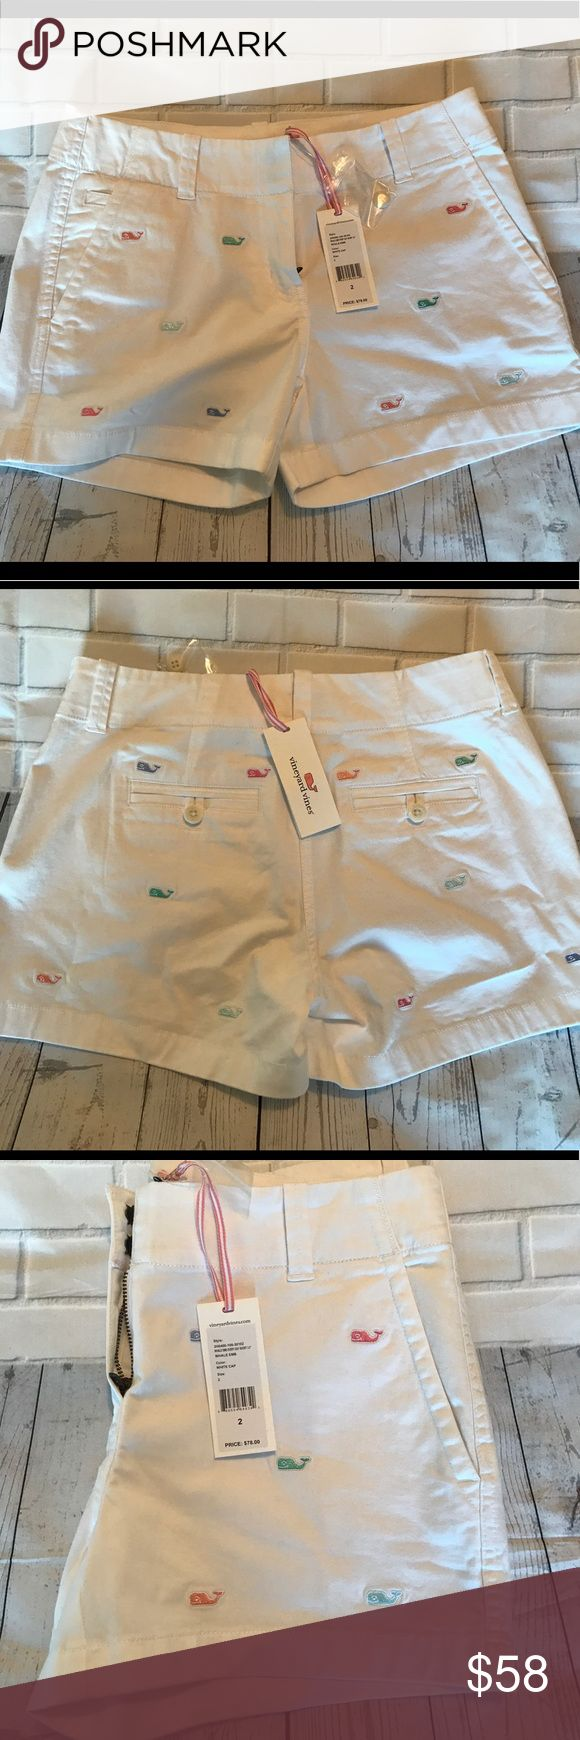 NWT WOMEN'S VINEYARD VINES WHALE LOGO CHINO SHORTS 🐳 NWT WOMEN'S VINEYARD VINES WHALE EMBLEM PRINT🐳 Size: 2. Color: White. Original Price $78.00 Vineyard Vines Shorts Bermudas